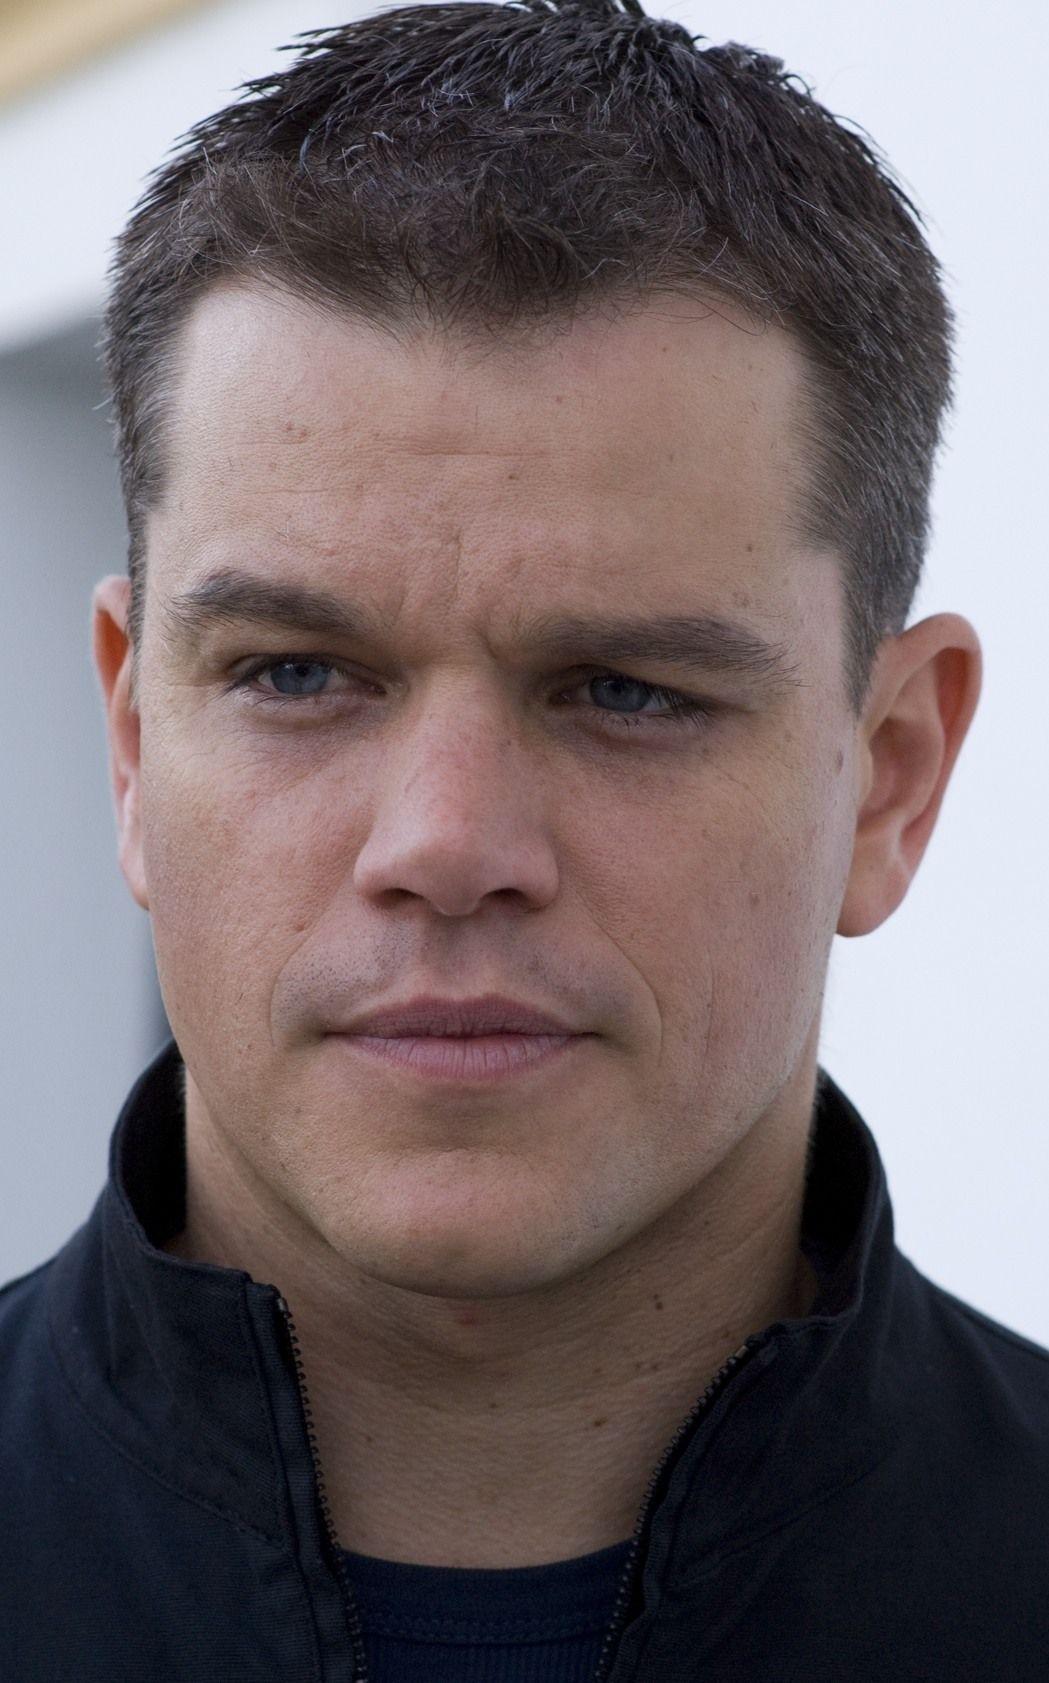 Matt Damon I love him in Bourne Identity!